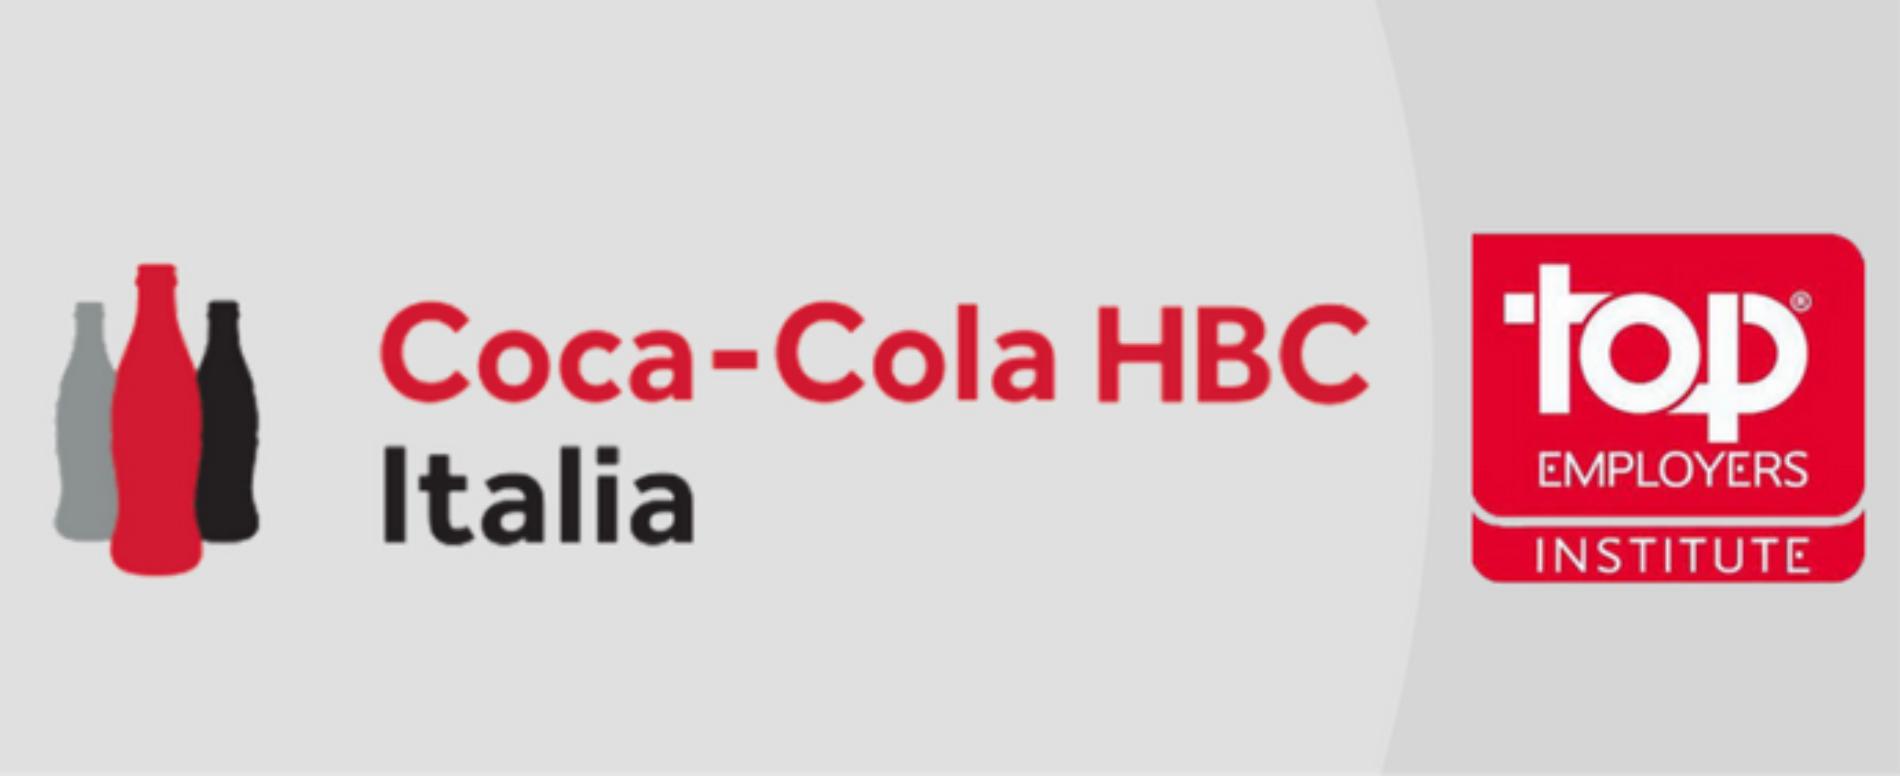 Coca-Cola HBC Italia Top Employer 2017